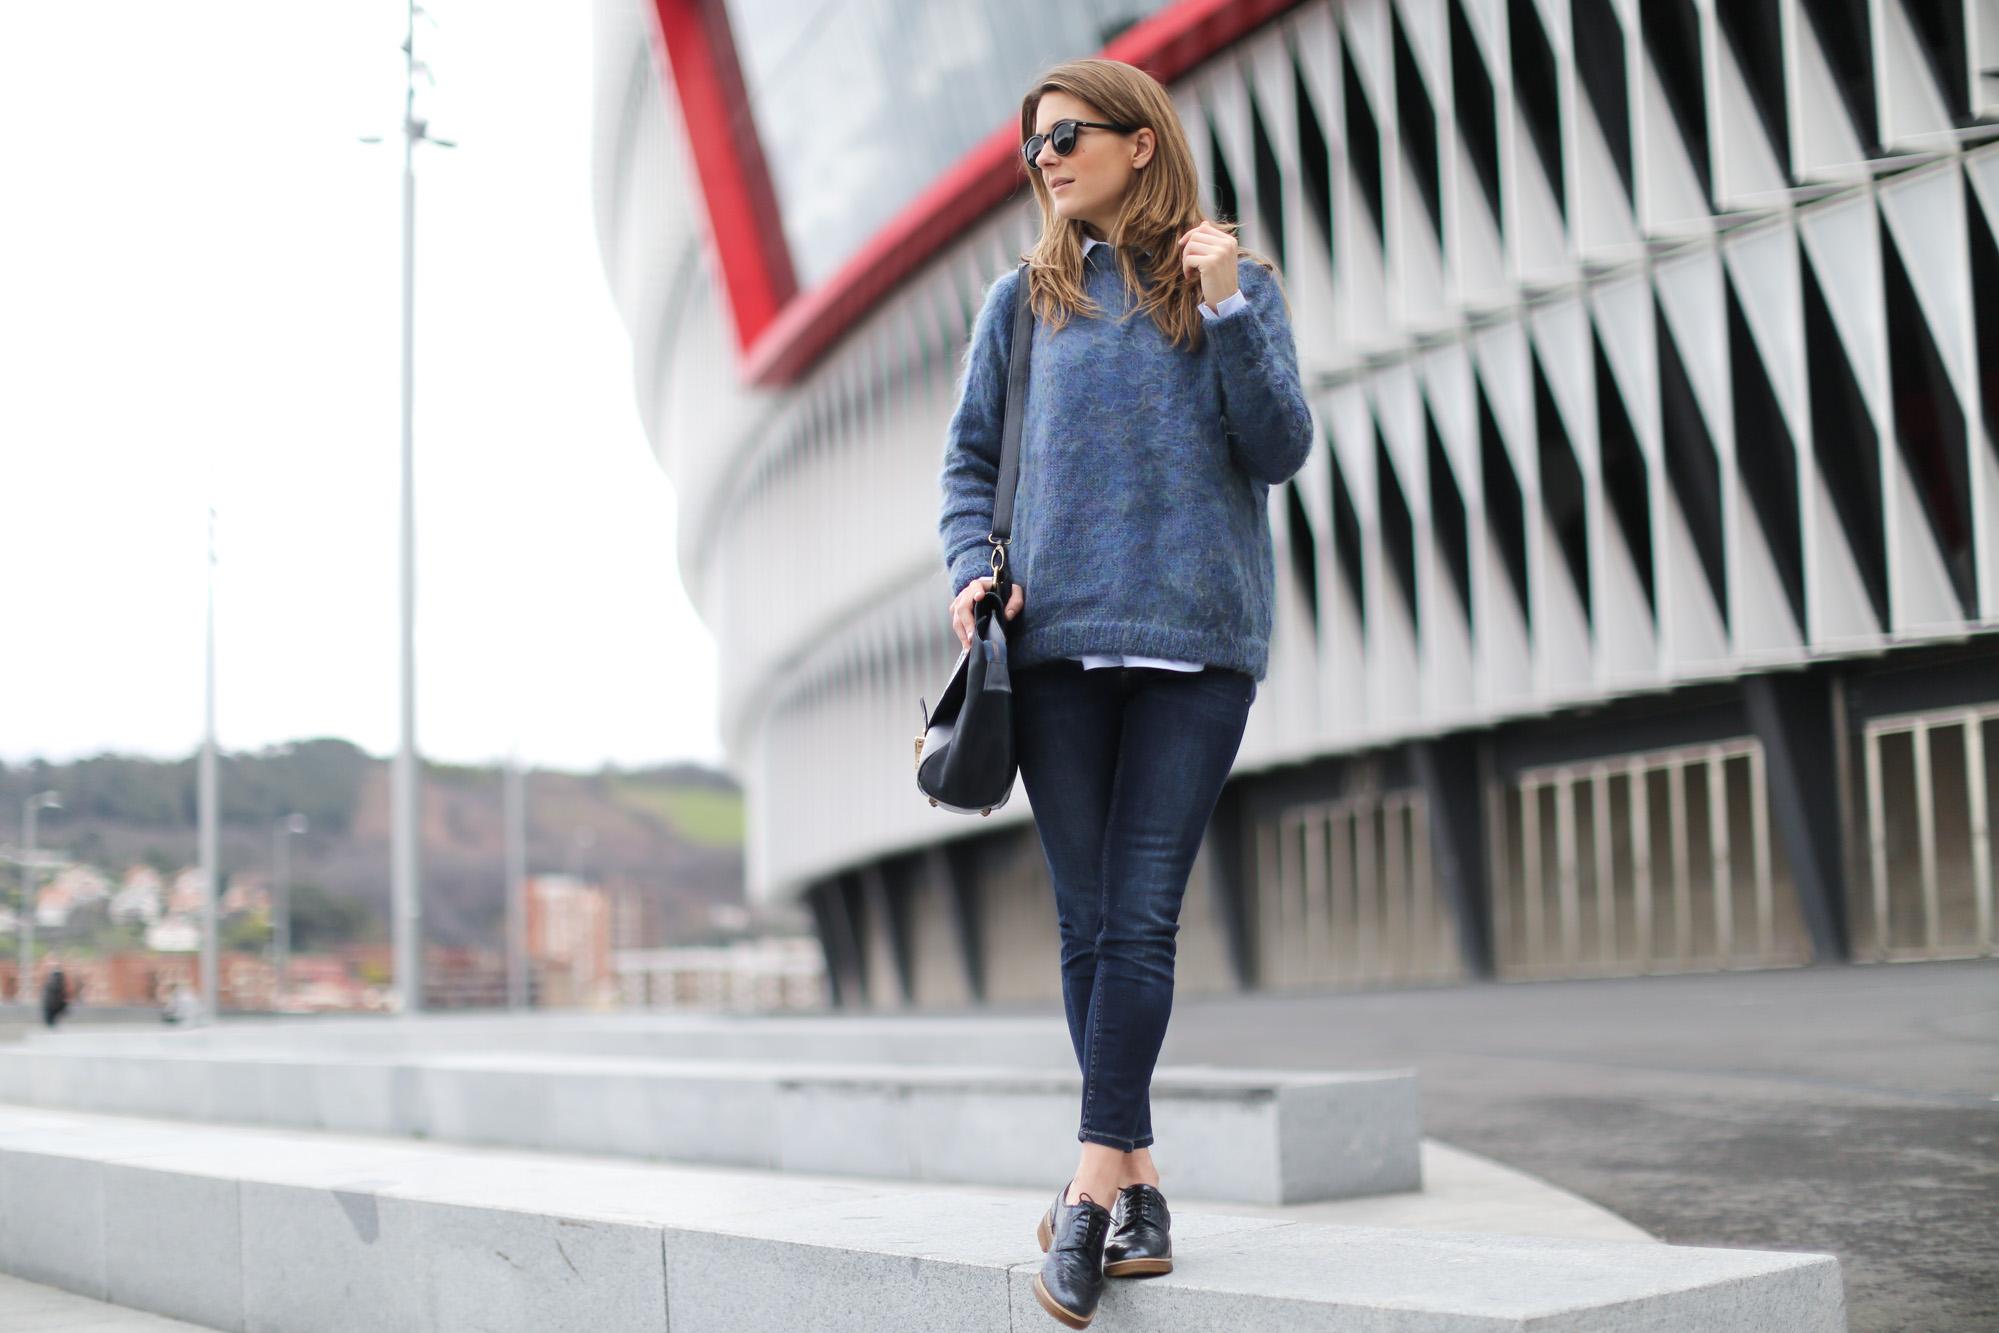 Clochet-streetstyle-bimbaylola-blue-knit-topshop-baxter-jeans-sushibag-6